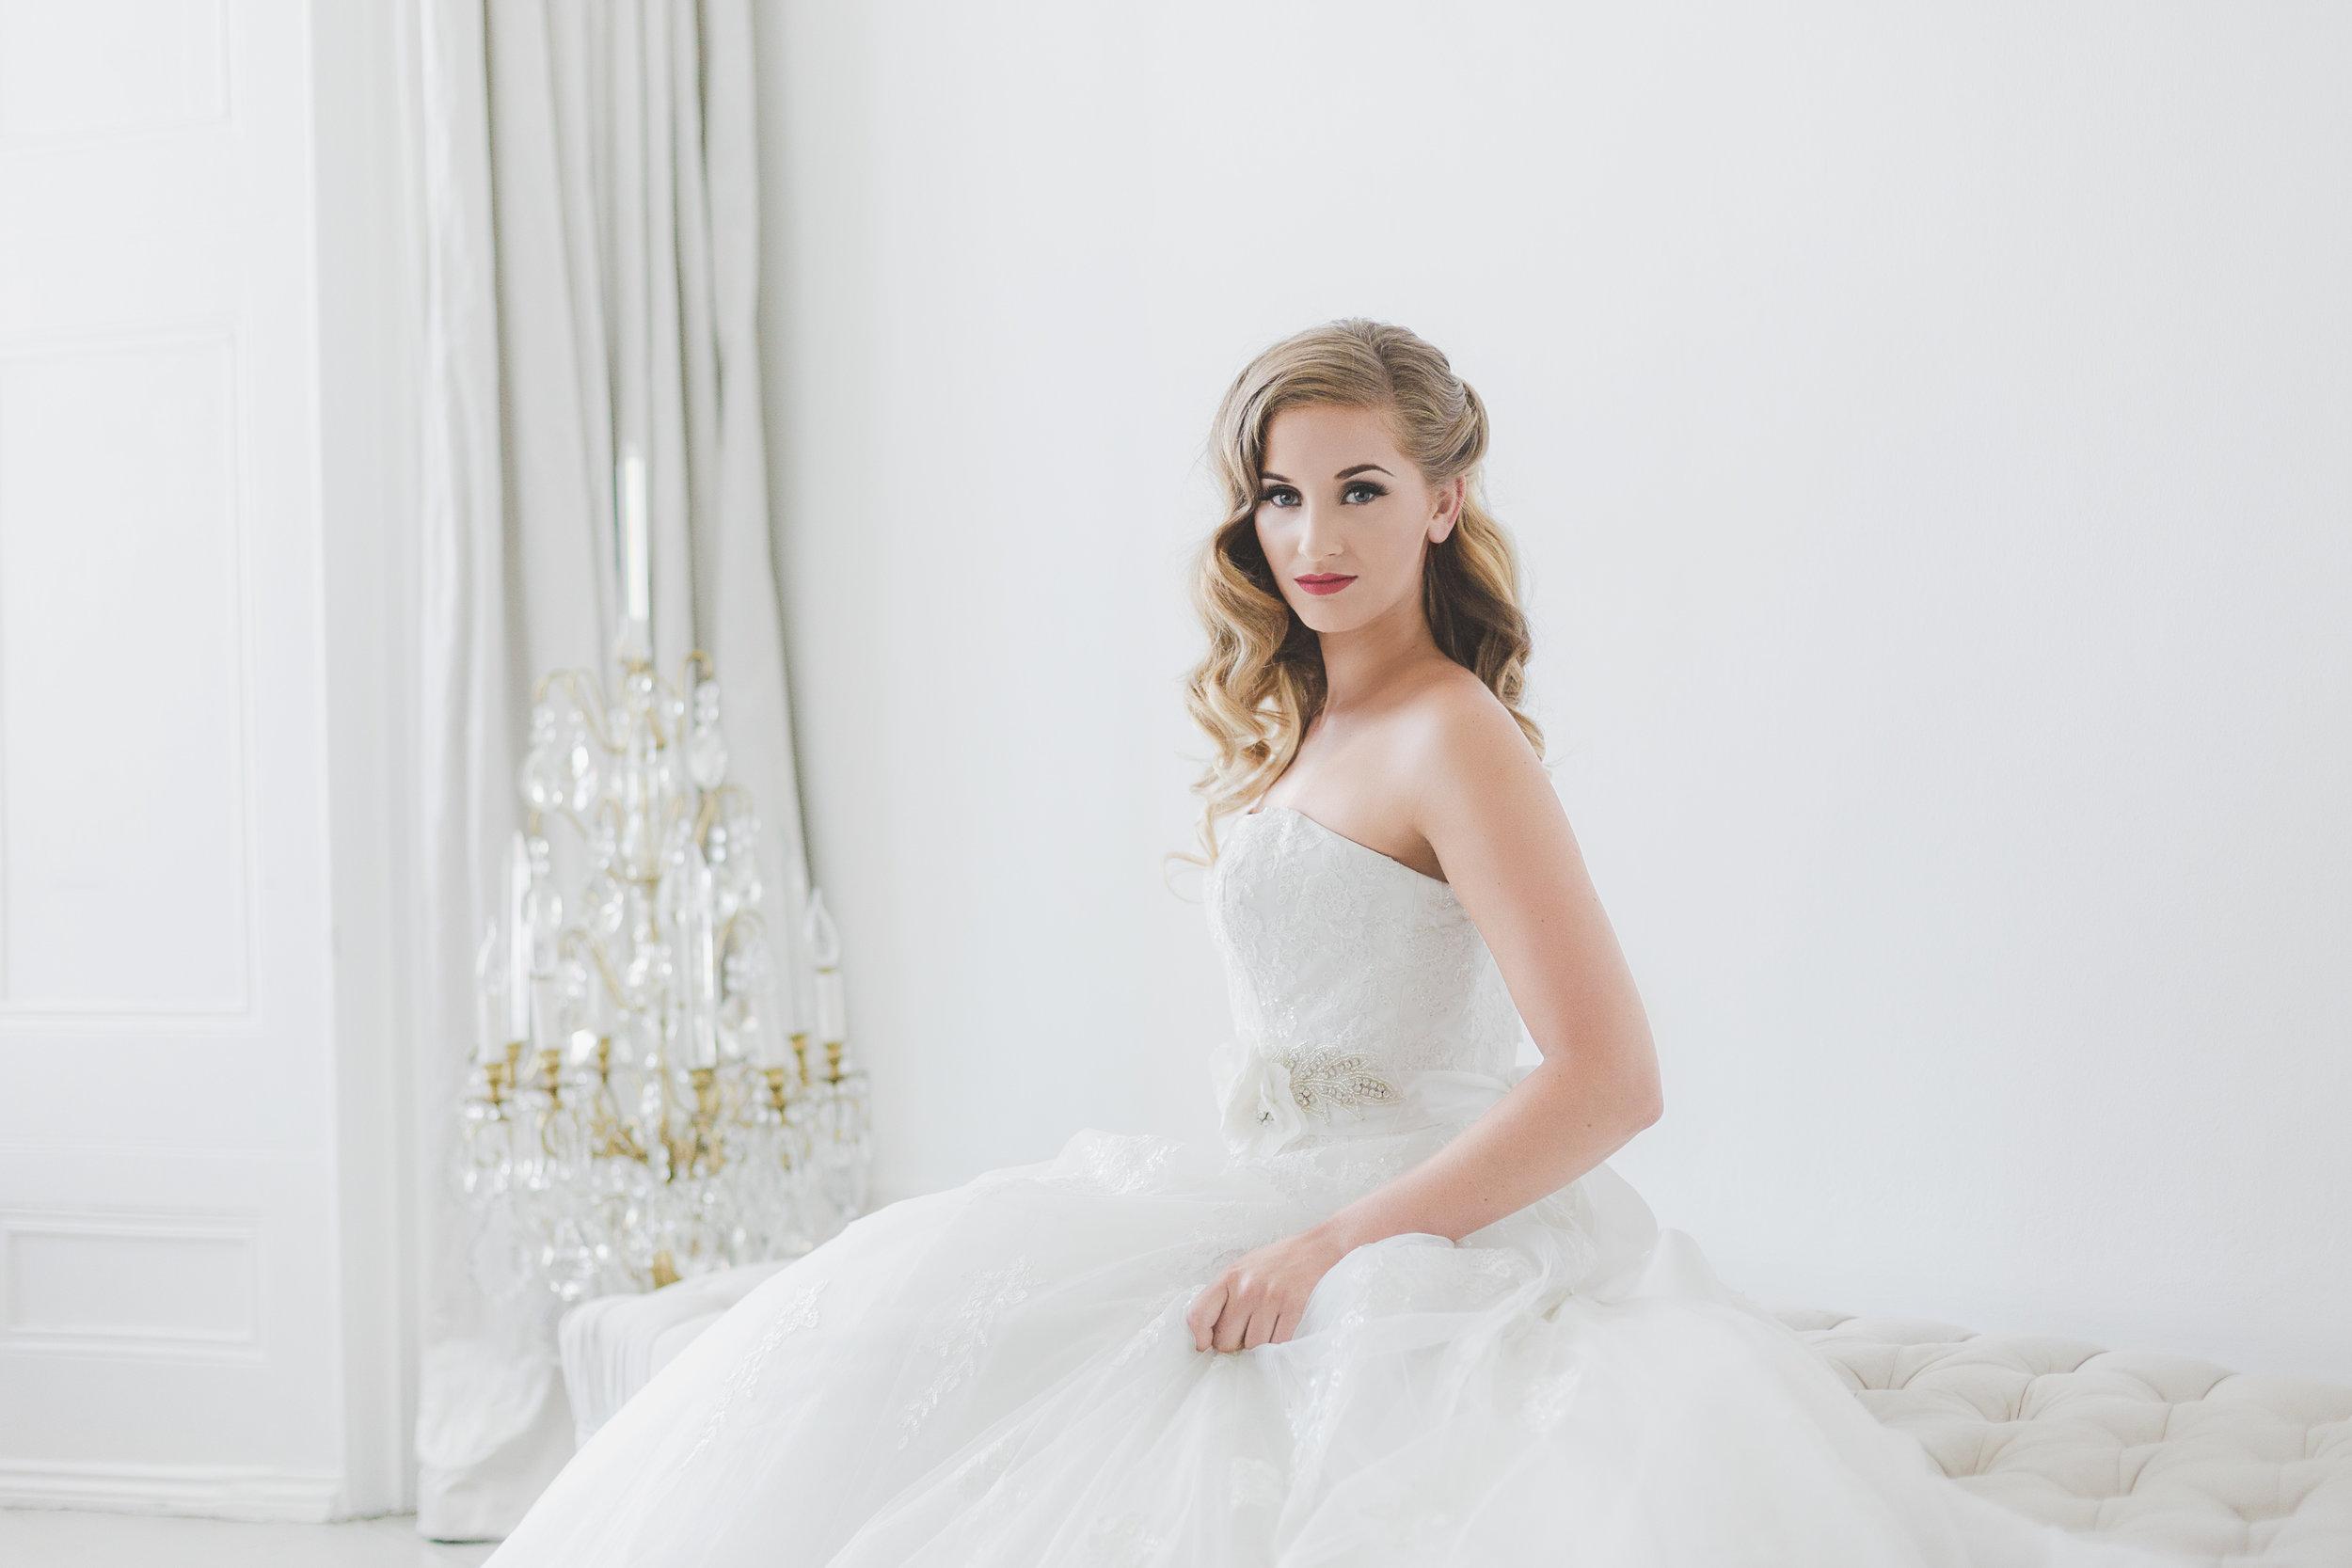 Glamorous Bridal Hair and Makeup Essex